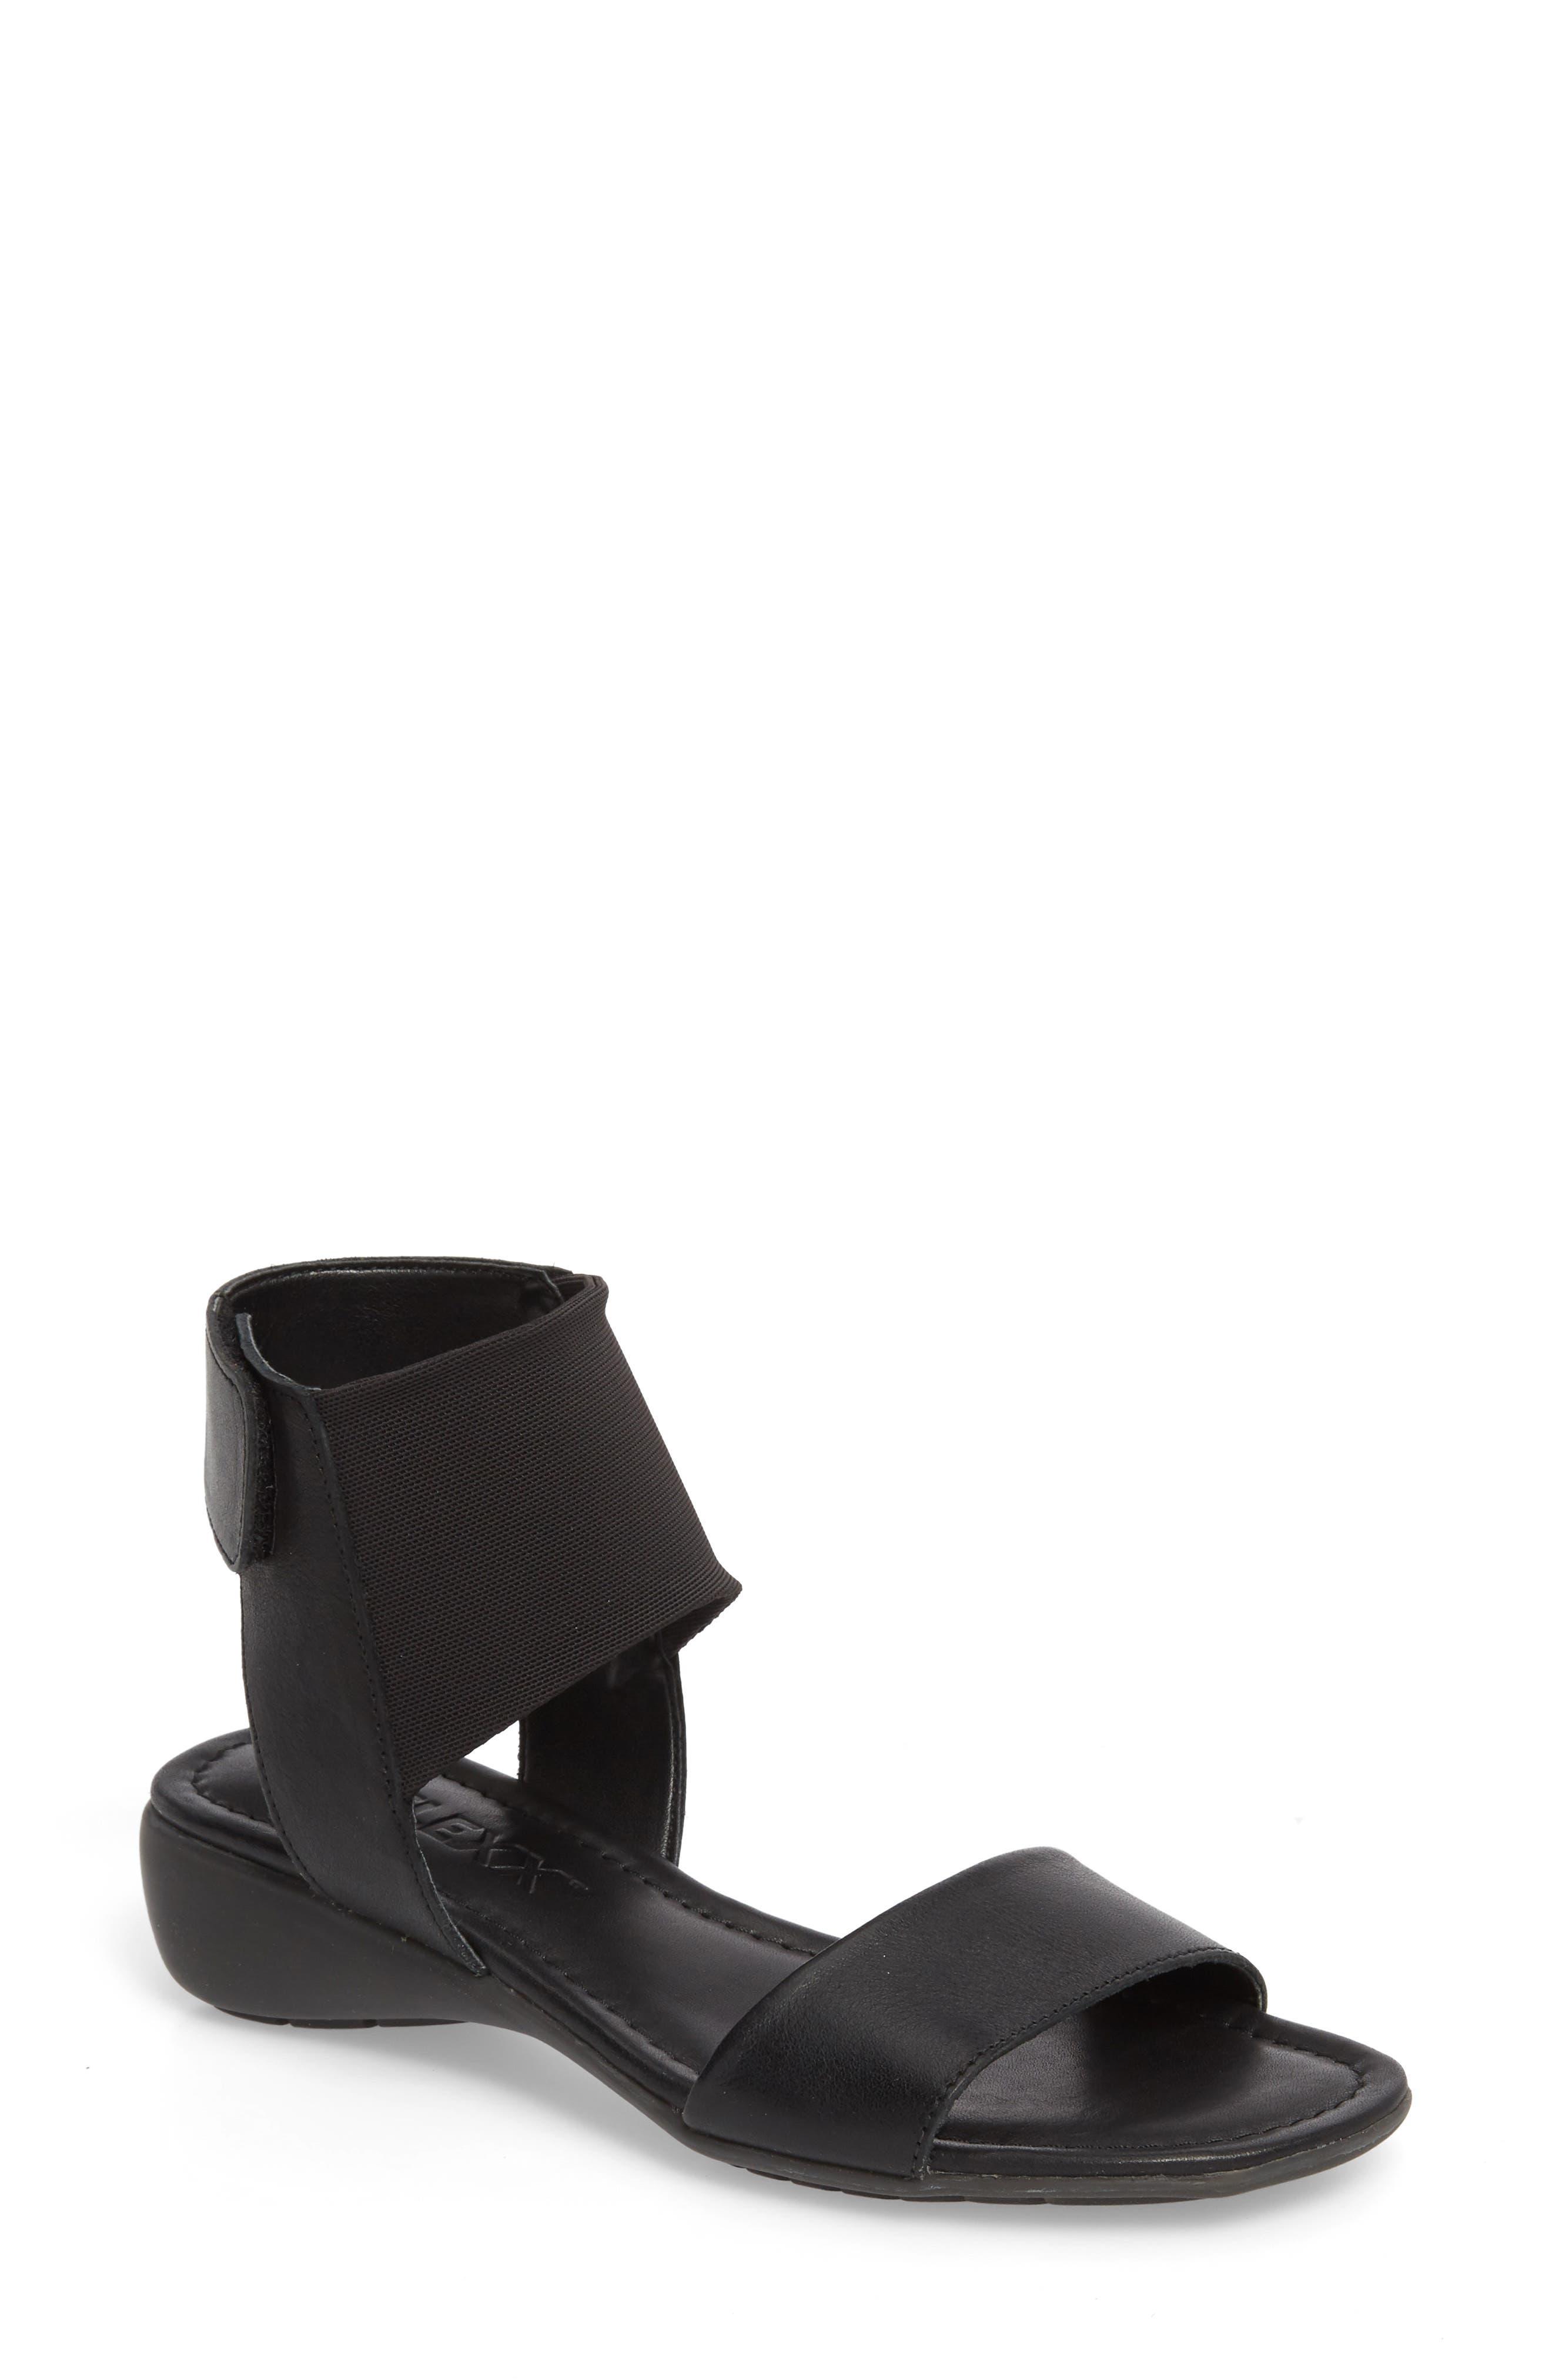 Band Jo Sandal,                         Main,                         color, Black Leather